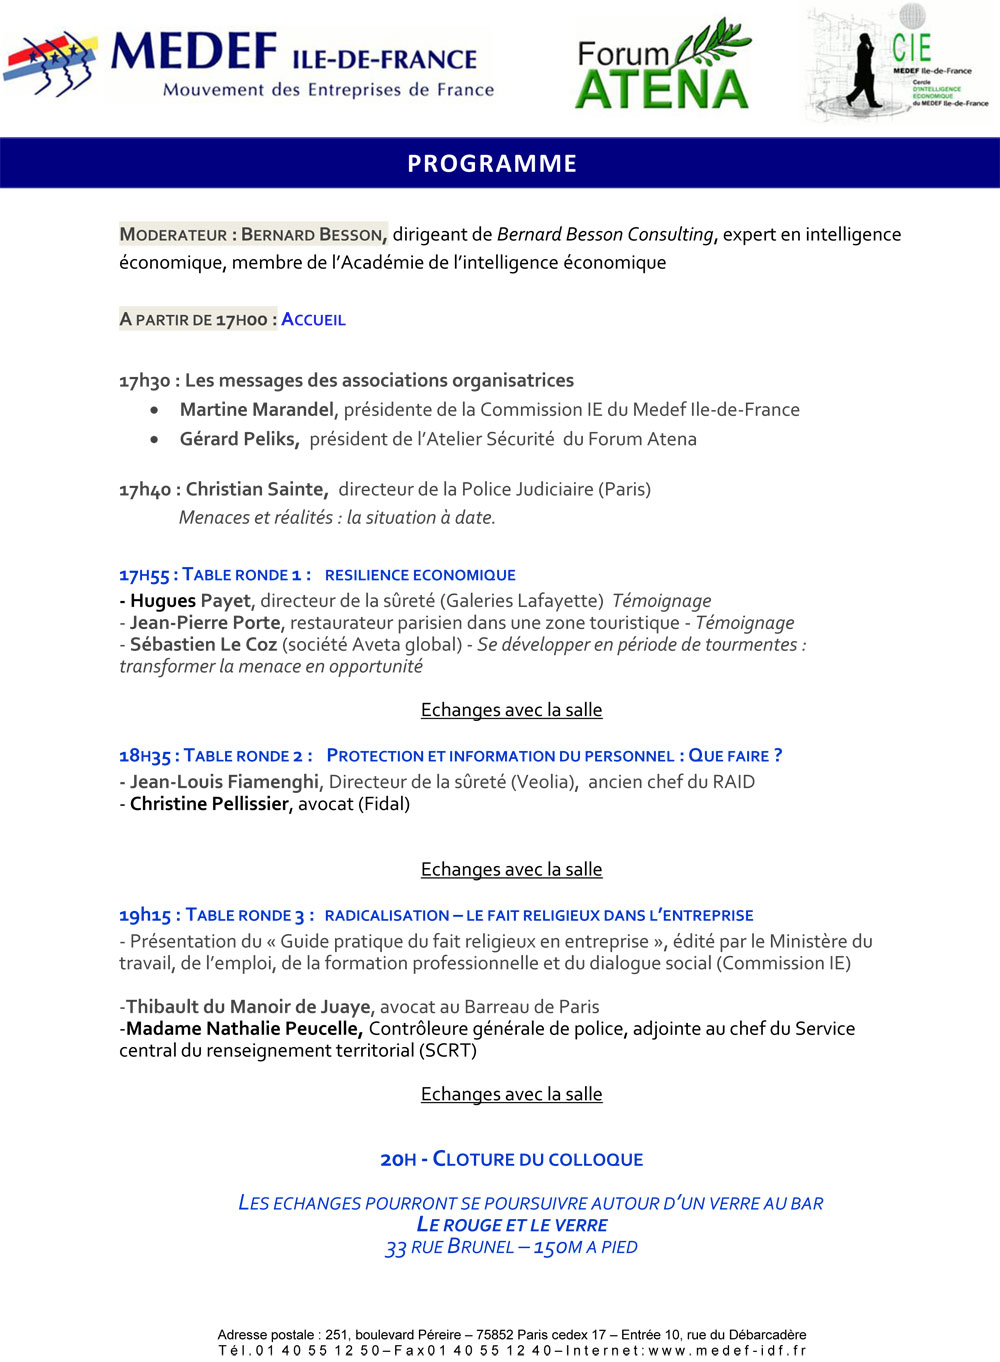 2-medef-ie-programme-colloque-au-9-novembre-2